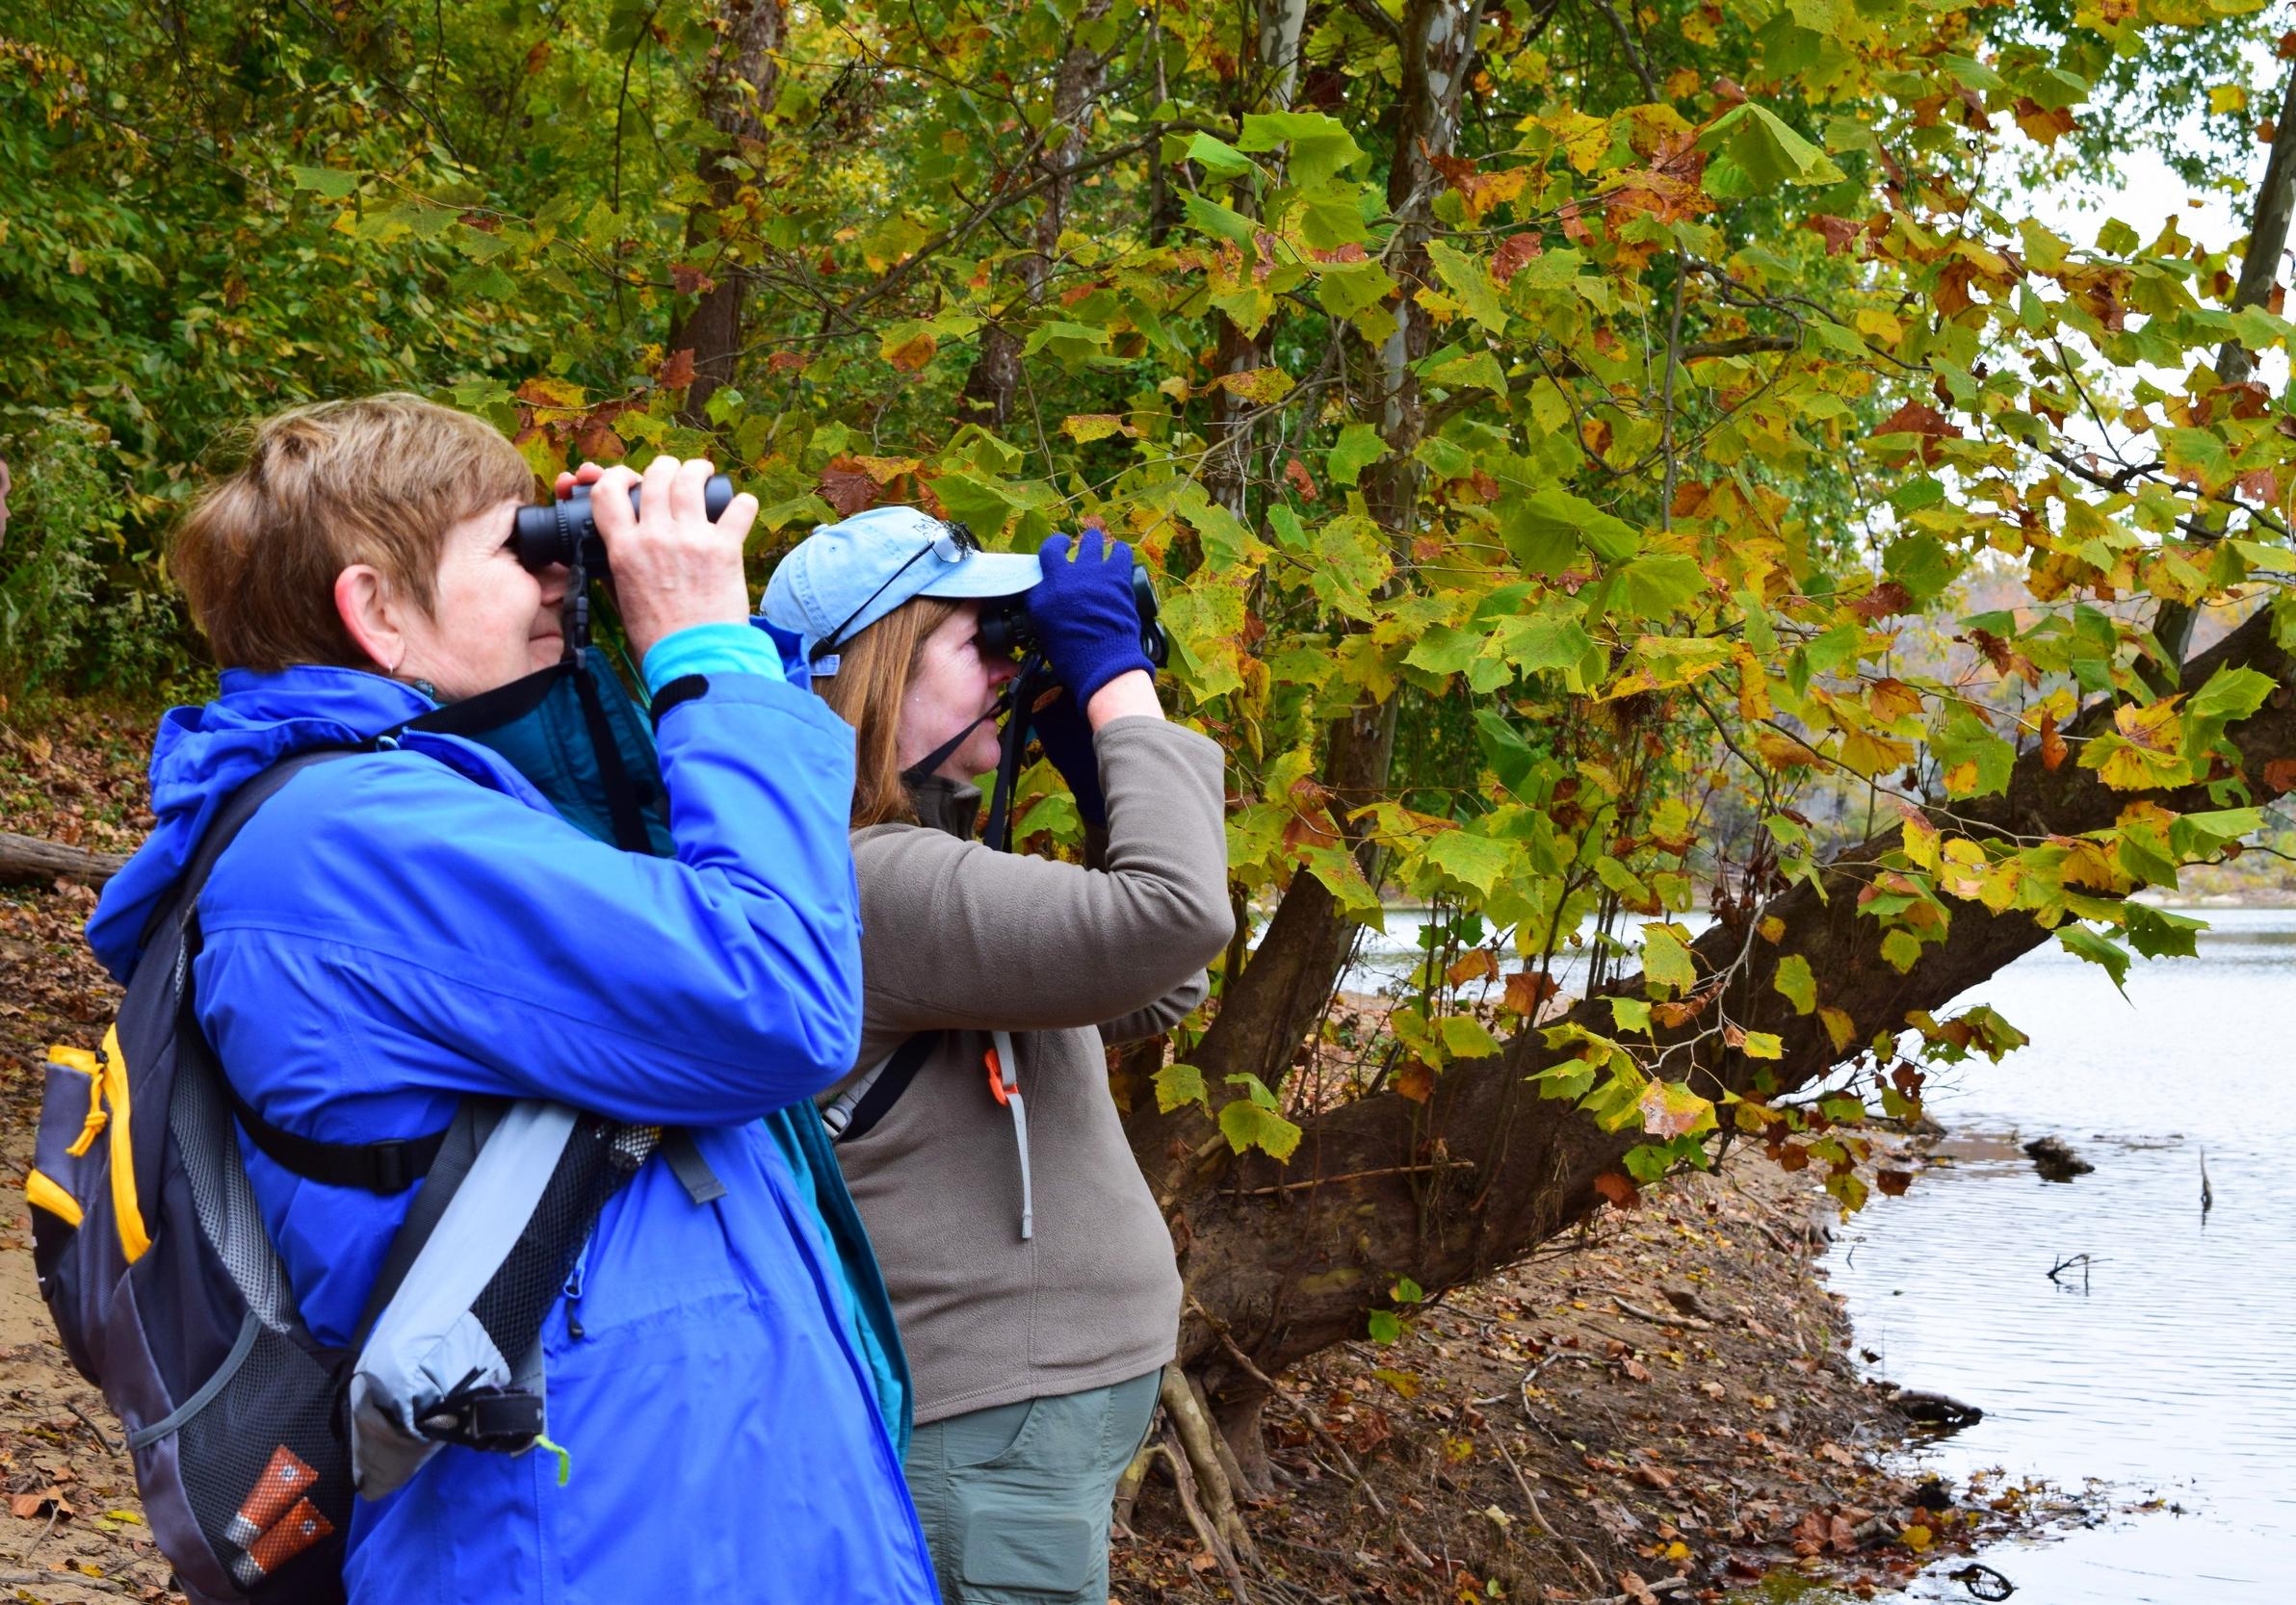 Potomac river binoculars